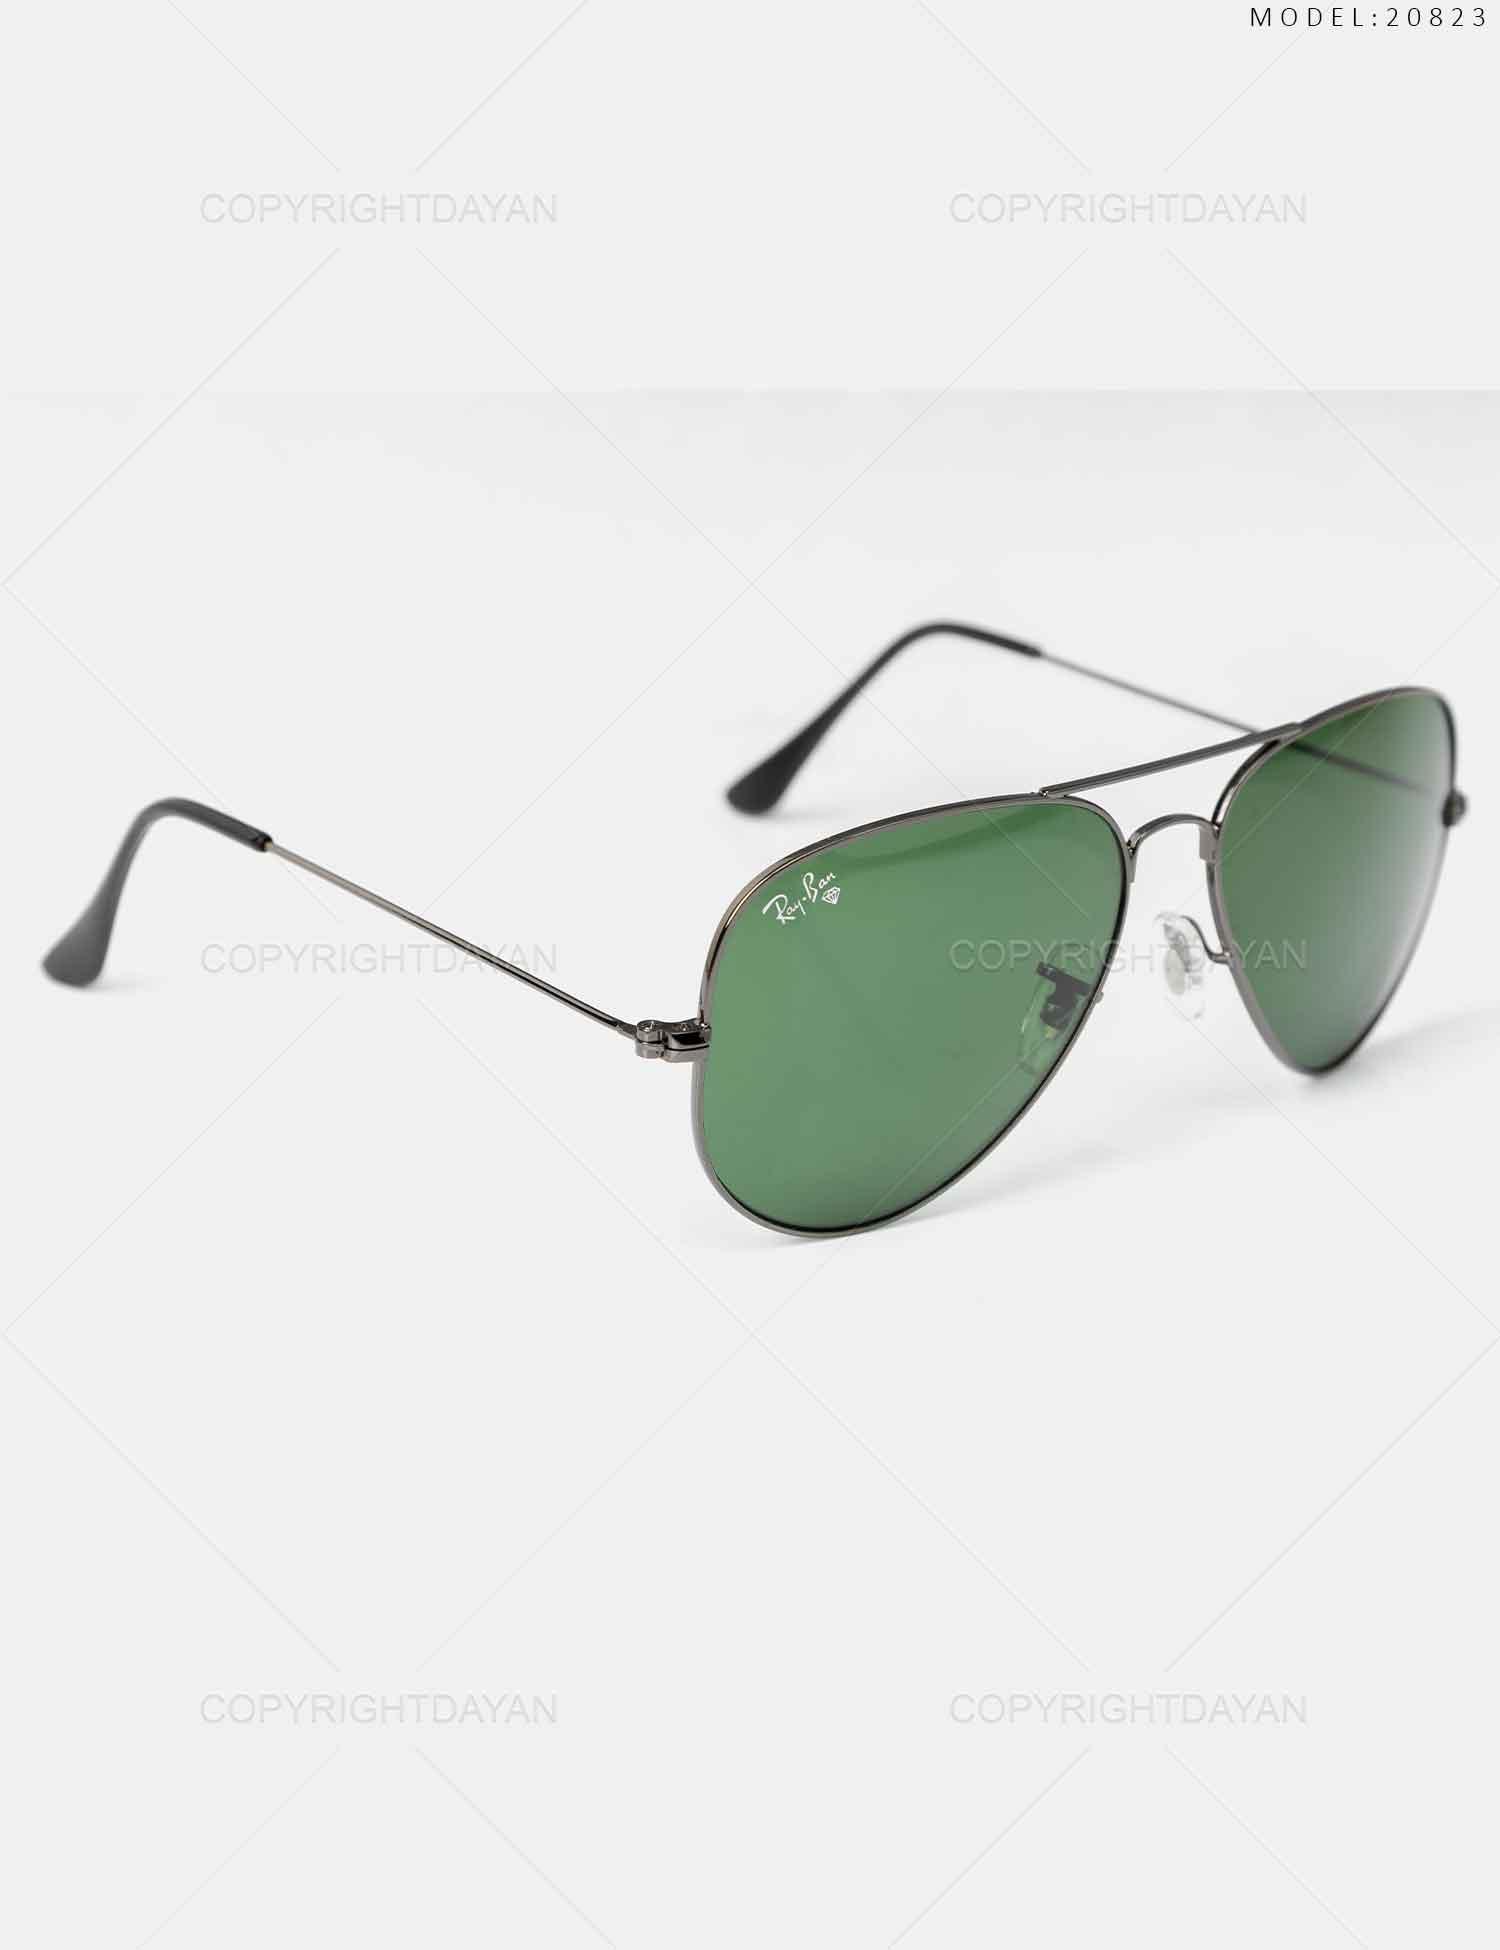 عینک آفتابی Ray Ban مدل 20823 عینک آفتابی Ray Ban مدل 20823 149,000 تومان